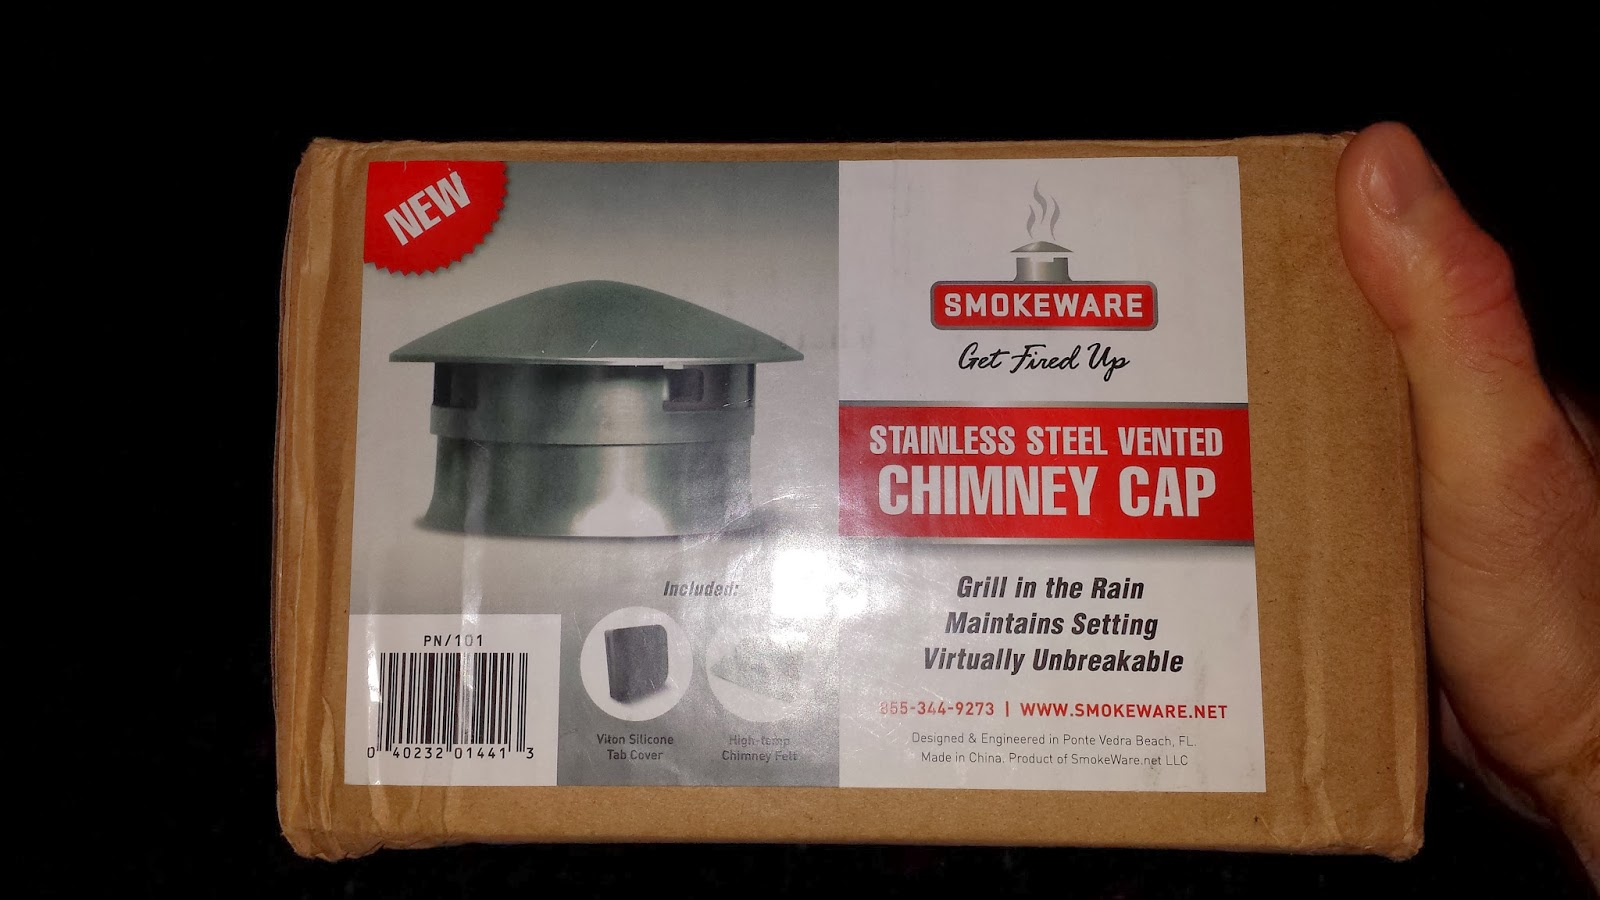 Kamado Joe Grilling Passion Smokeware Chimney Vented Cap